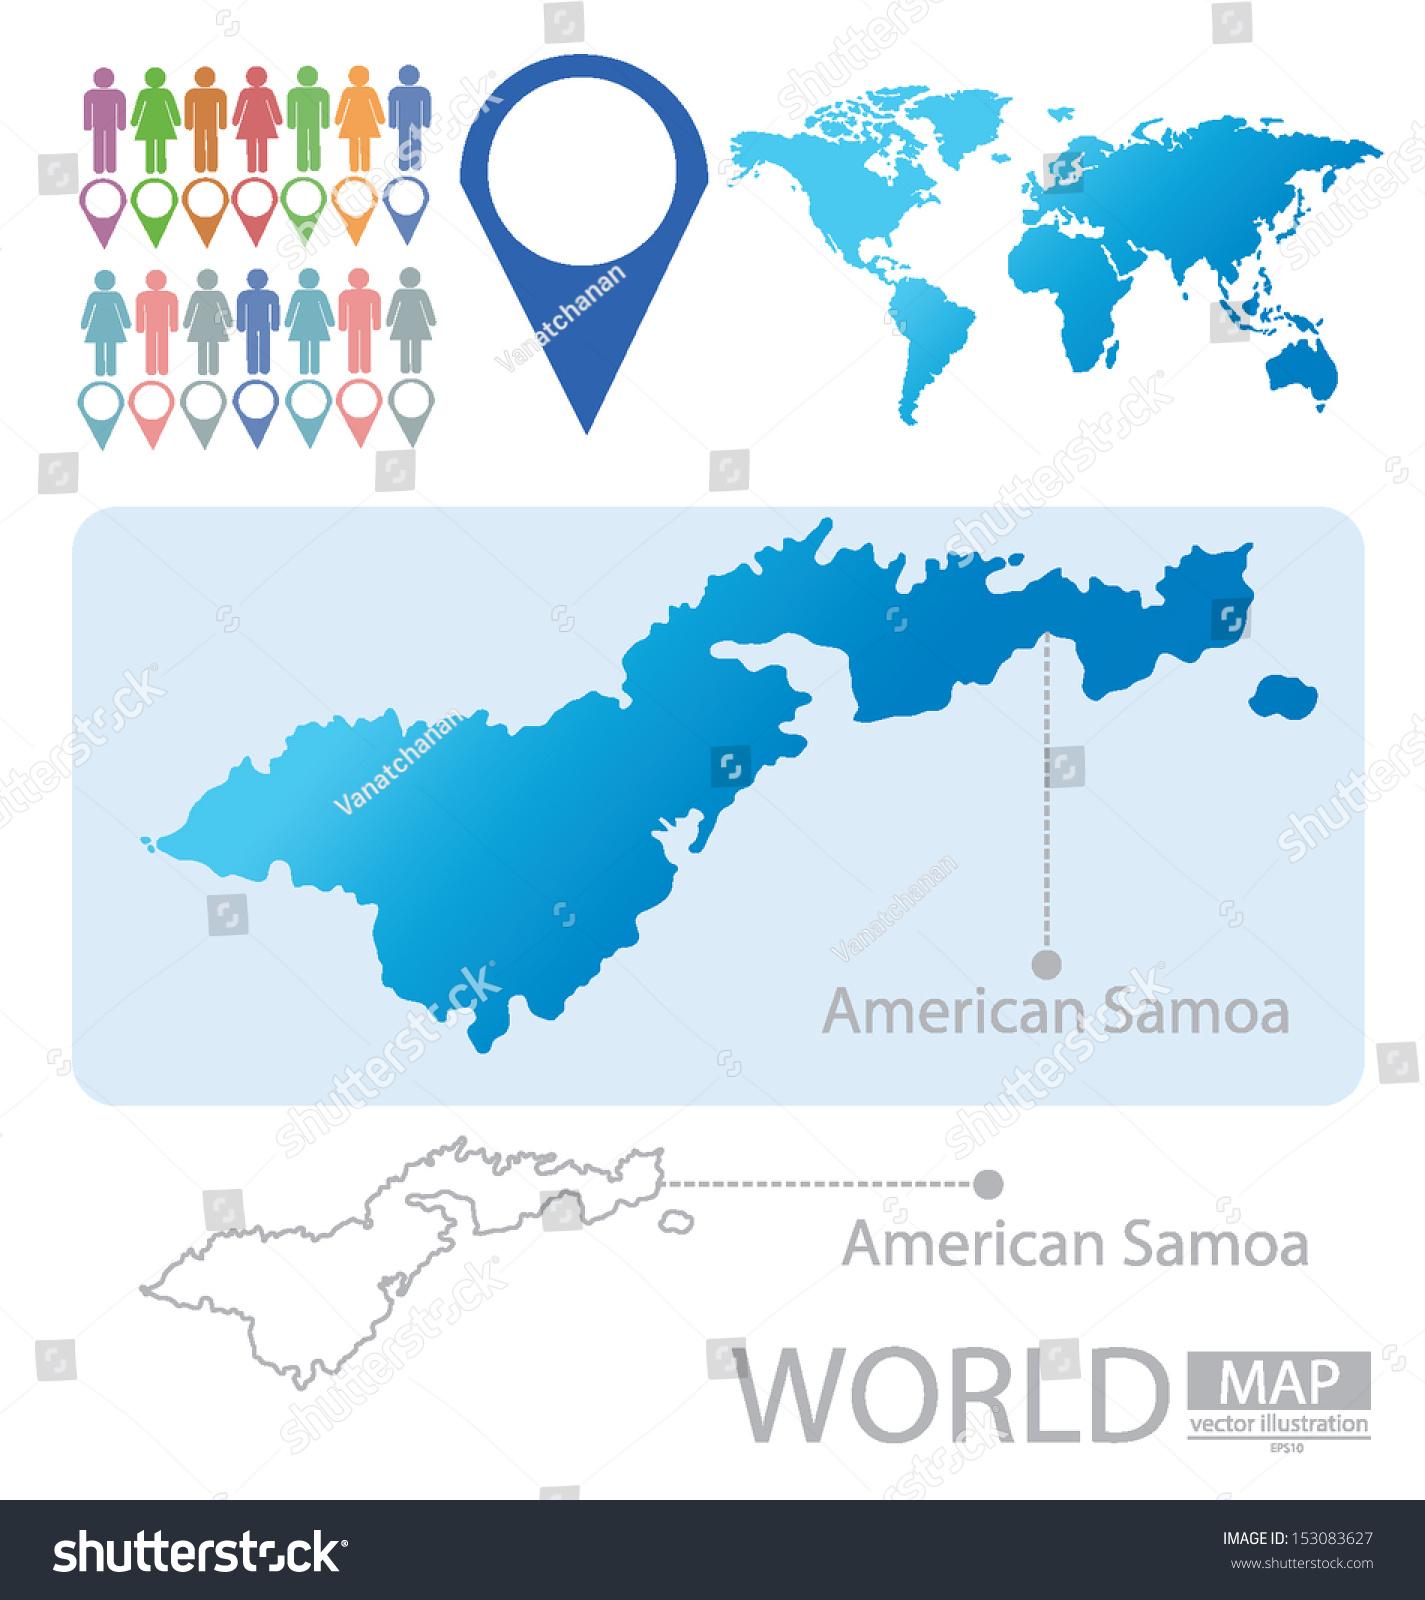 Maps Update 780323 American Samoa in World Map Samoa Map and – Samoa on World Map